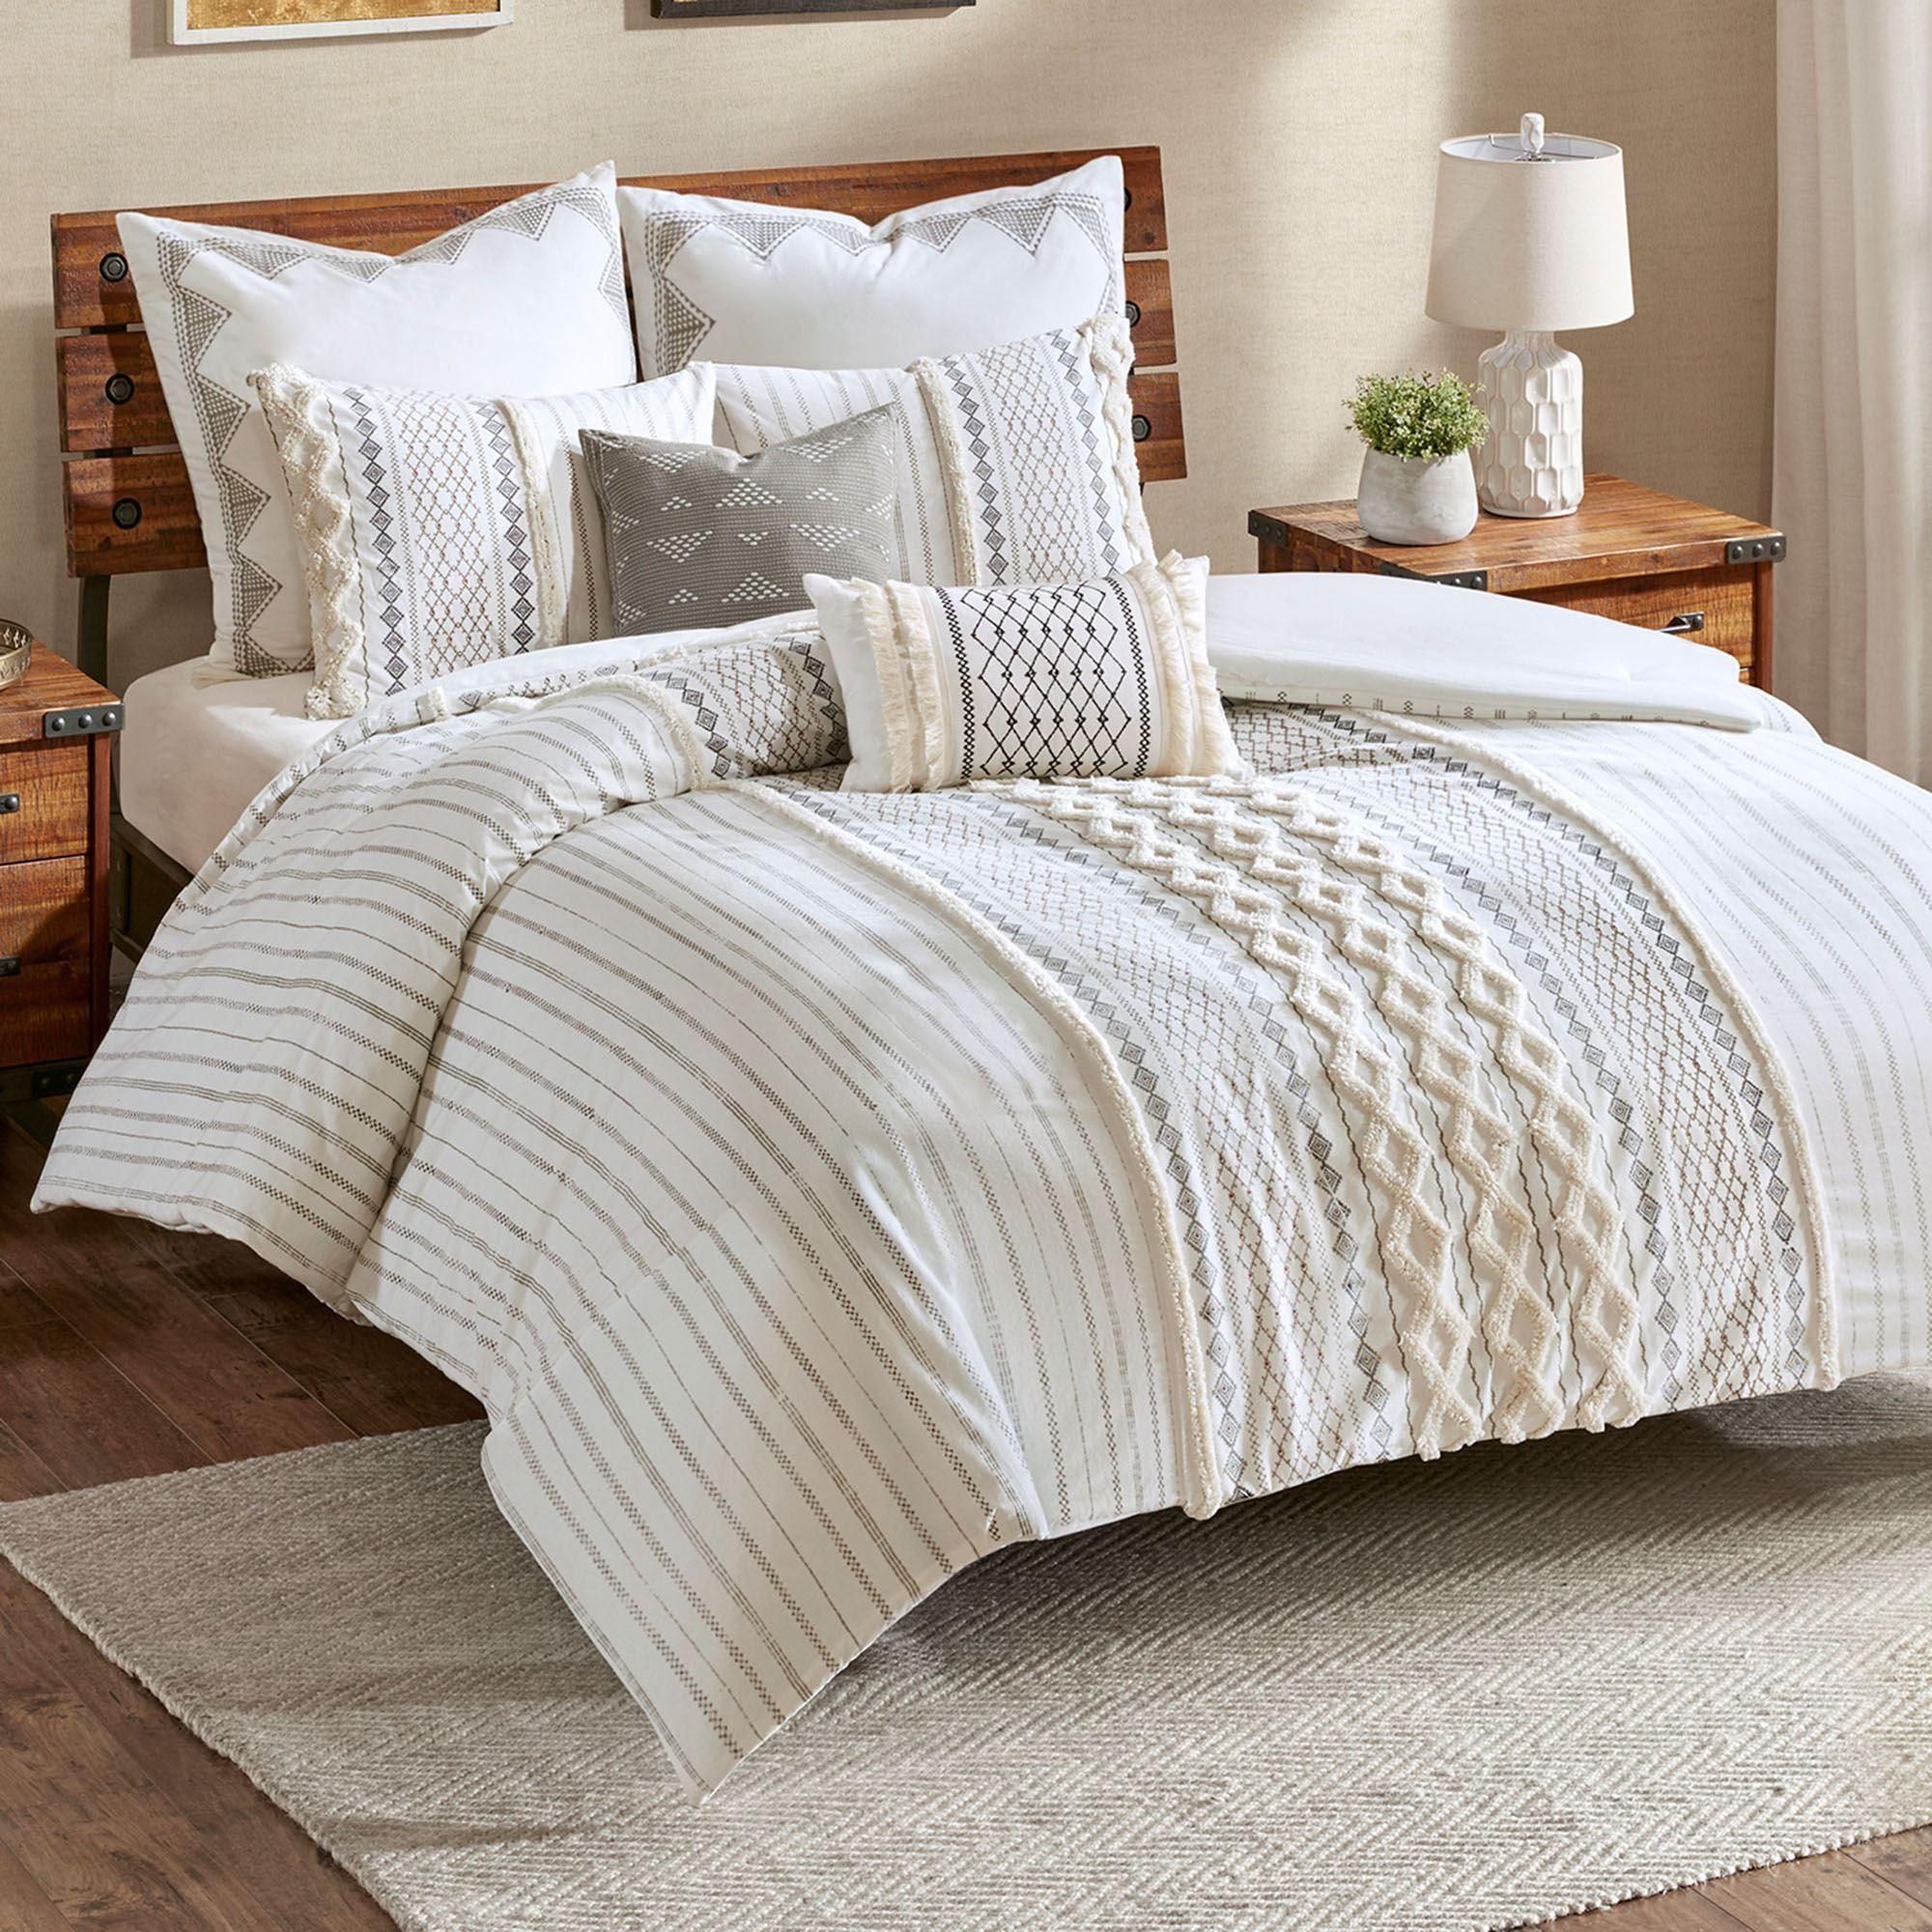 Imani Geometric Mini Comforter Set Bedding by INK+IVY